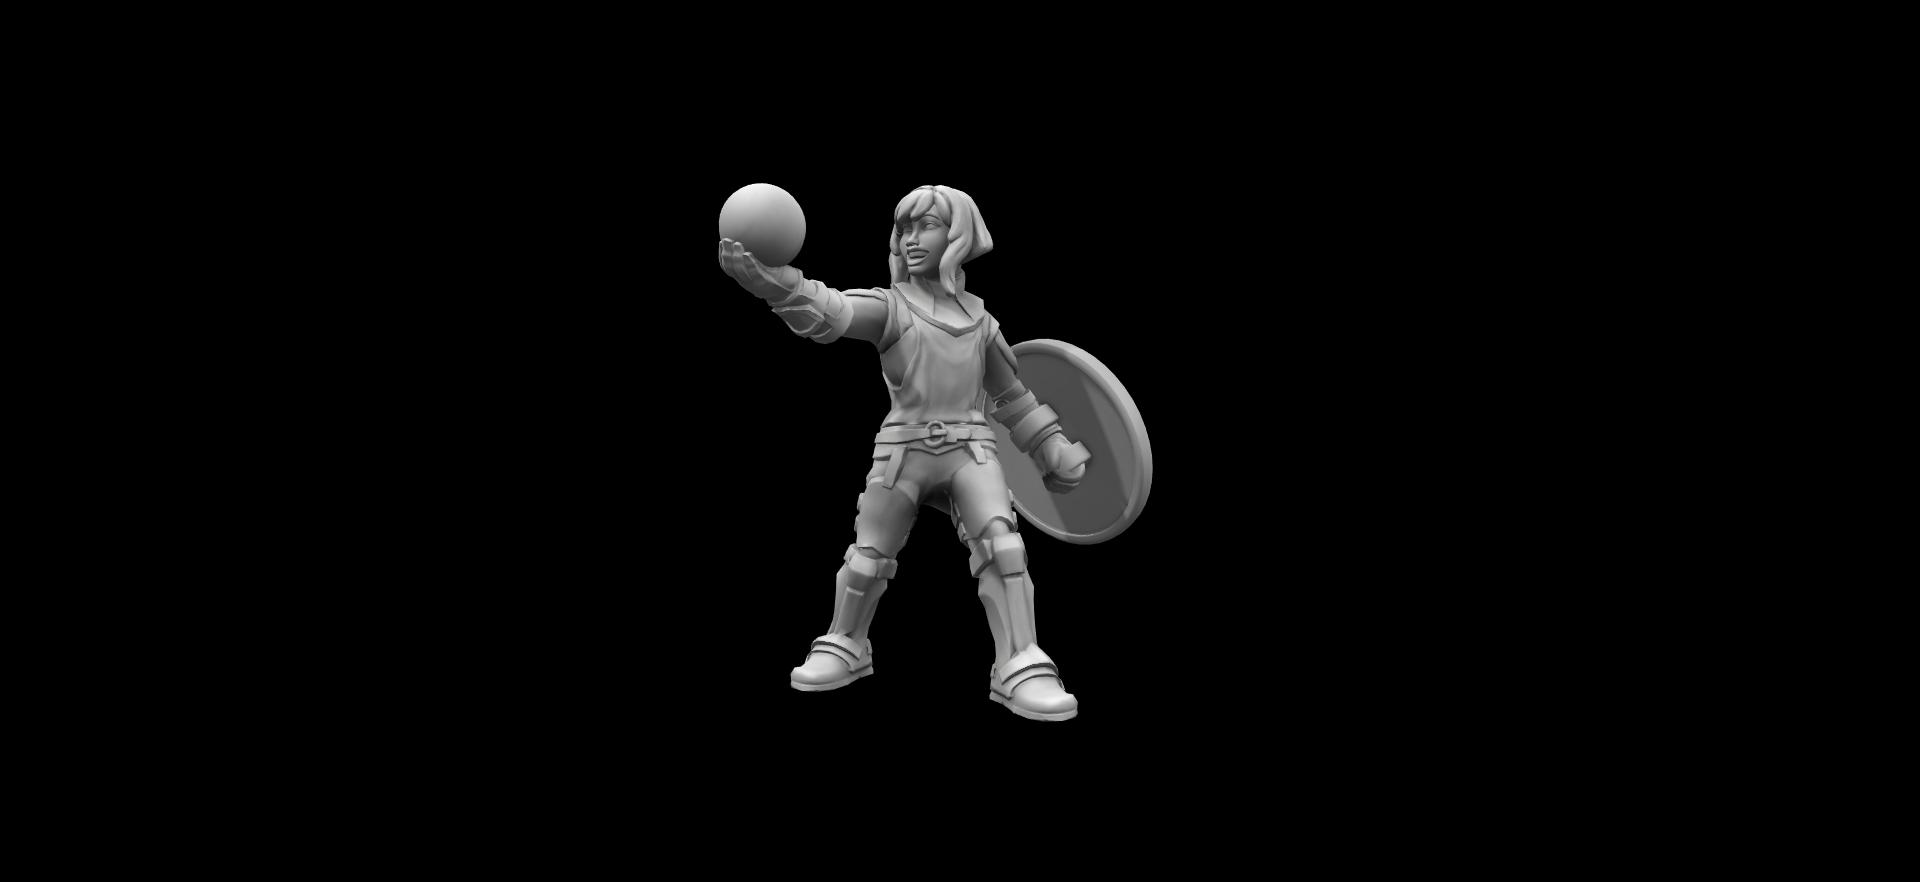 HeroForgeScreenshot (35)